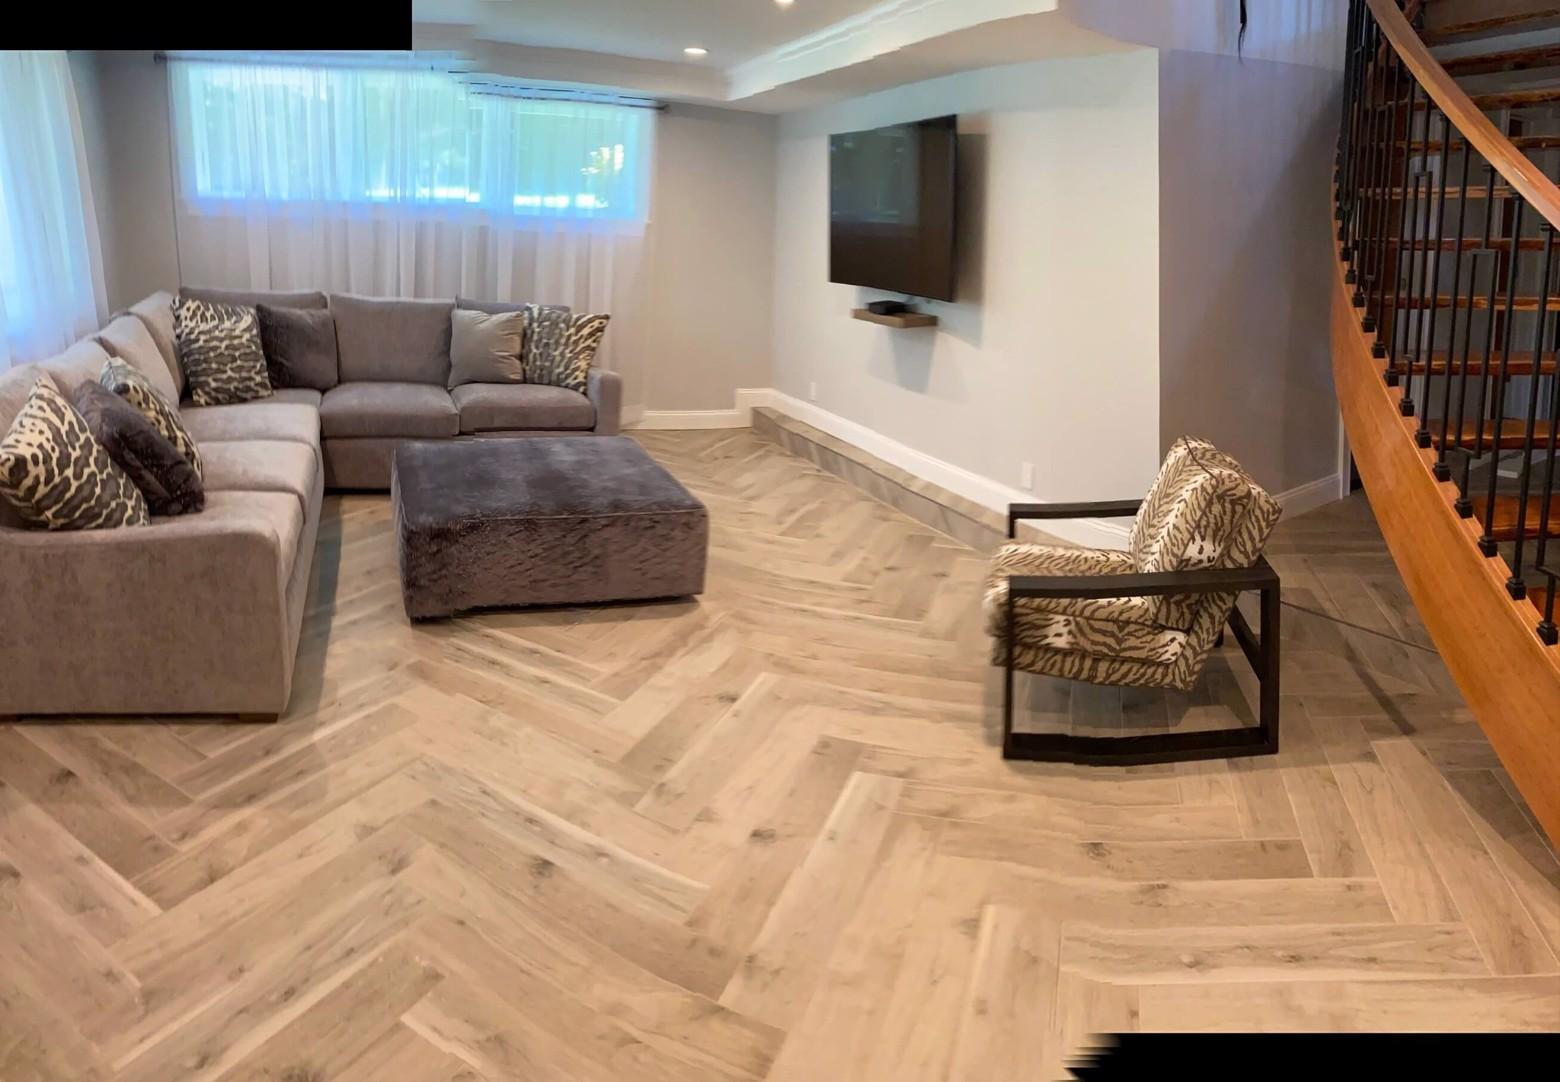 lorenza-ventura-living-room-3.jpeg image